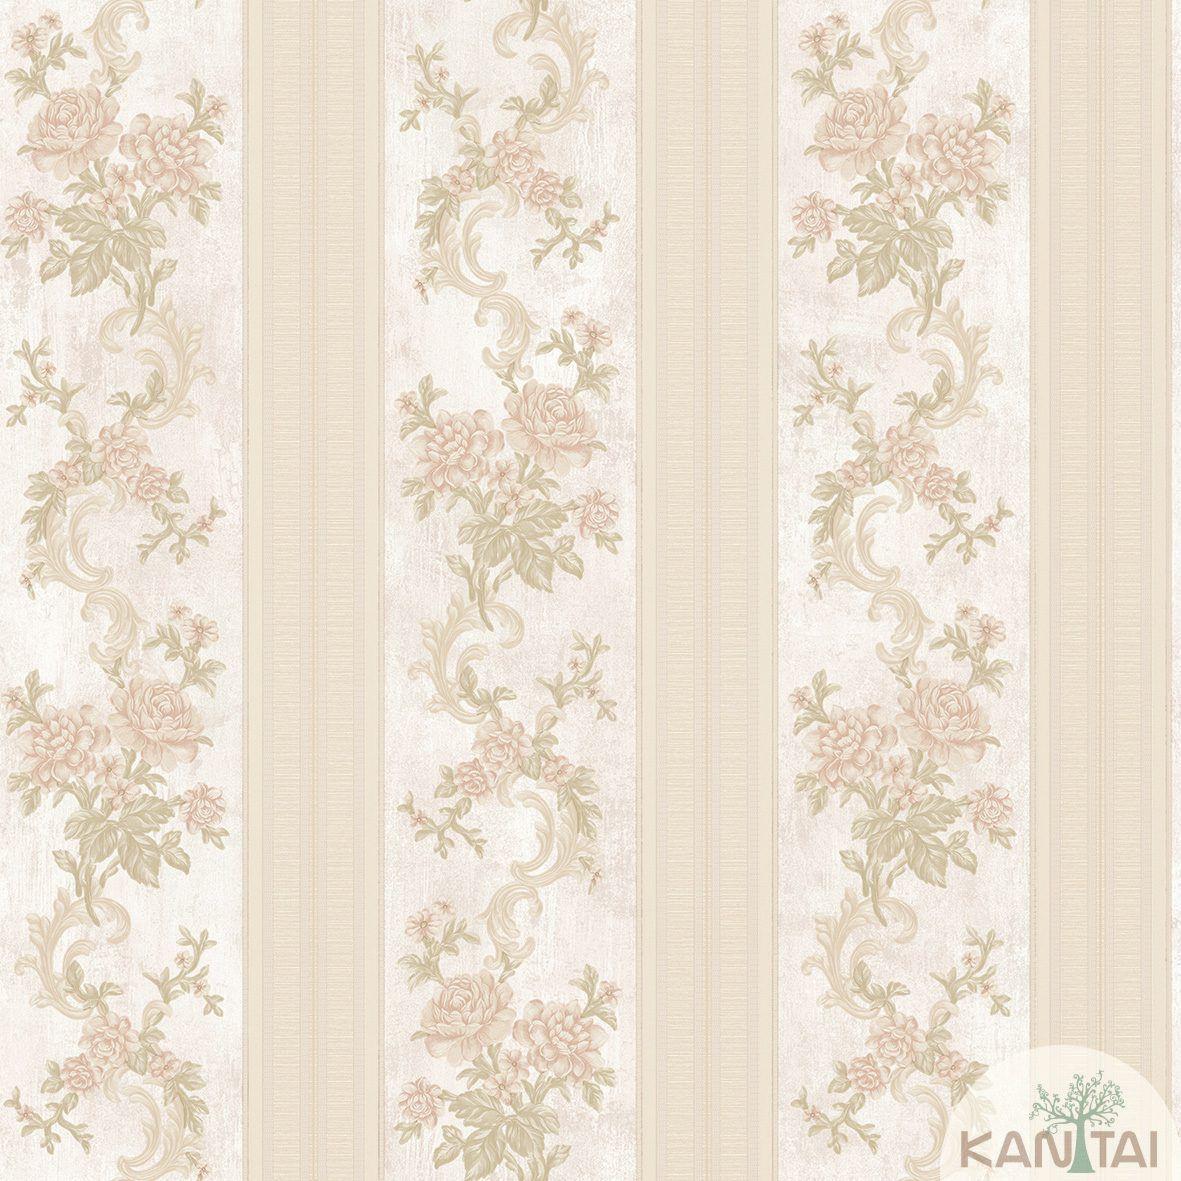 Papel de Parede Kan Tai Non Woven Coleção Flora 2 Baixo relevo Floral Listras, Rosê, Verde, Rosa, Dourado